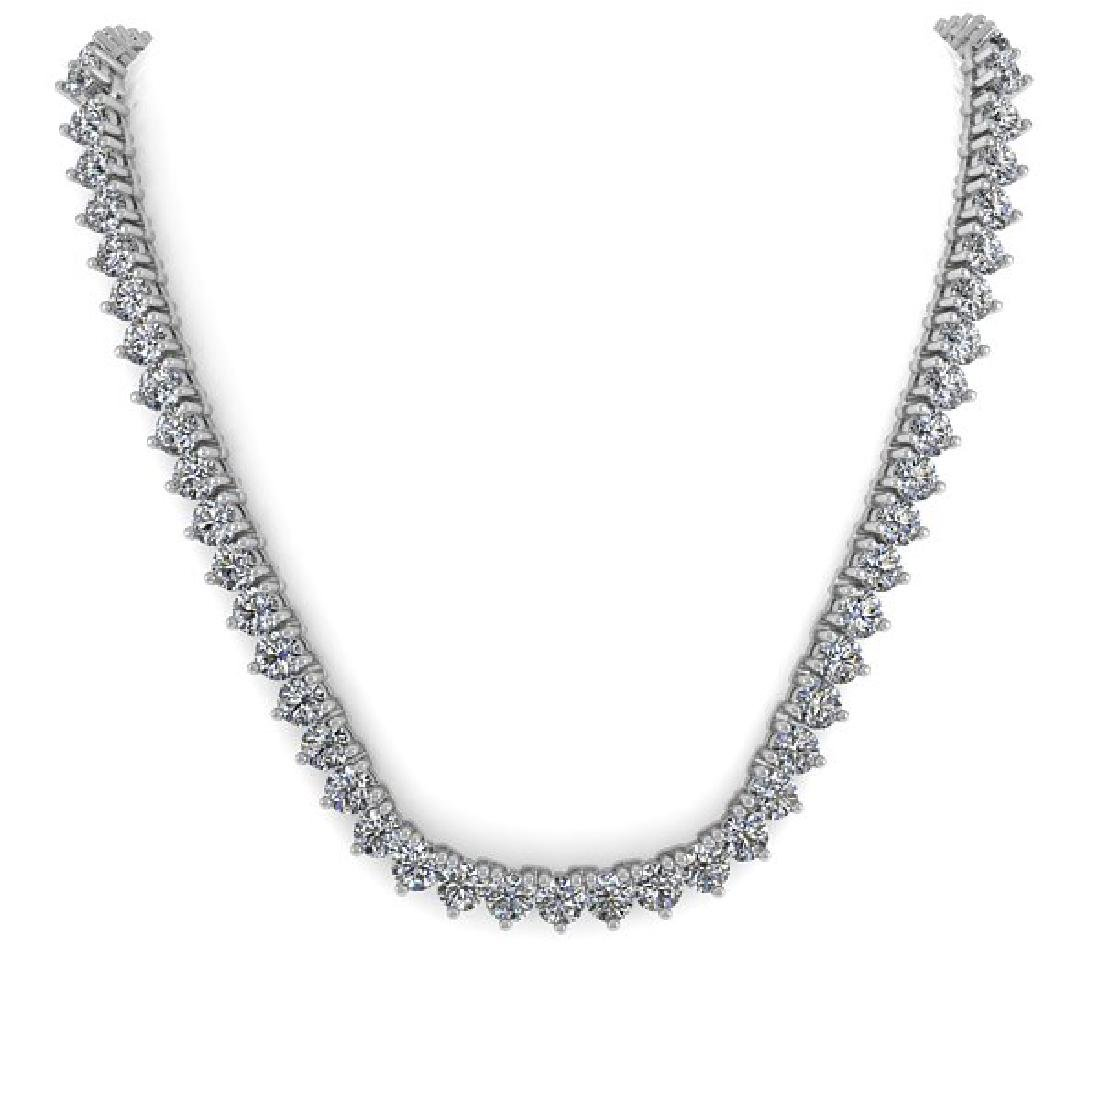 48 CTW Solitaire SI Diamond Necklace 18K White Gold - 2